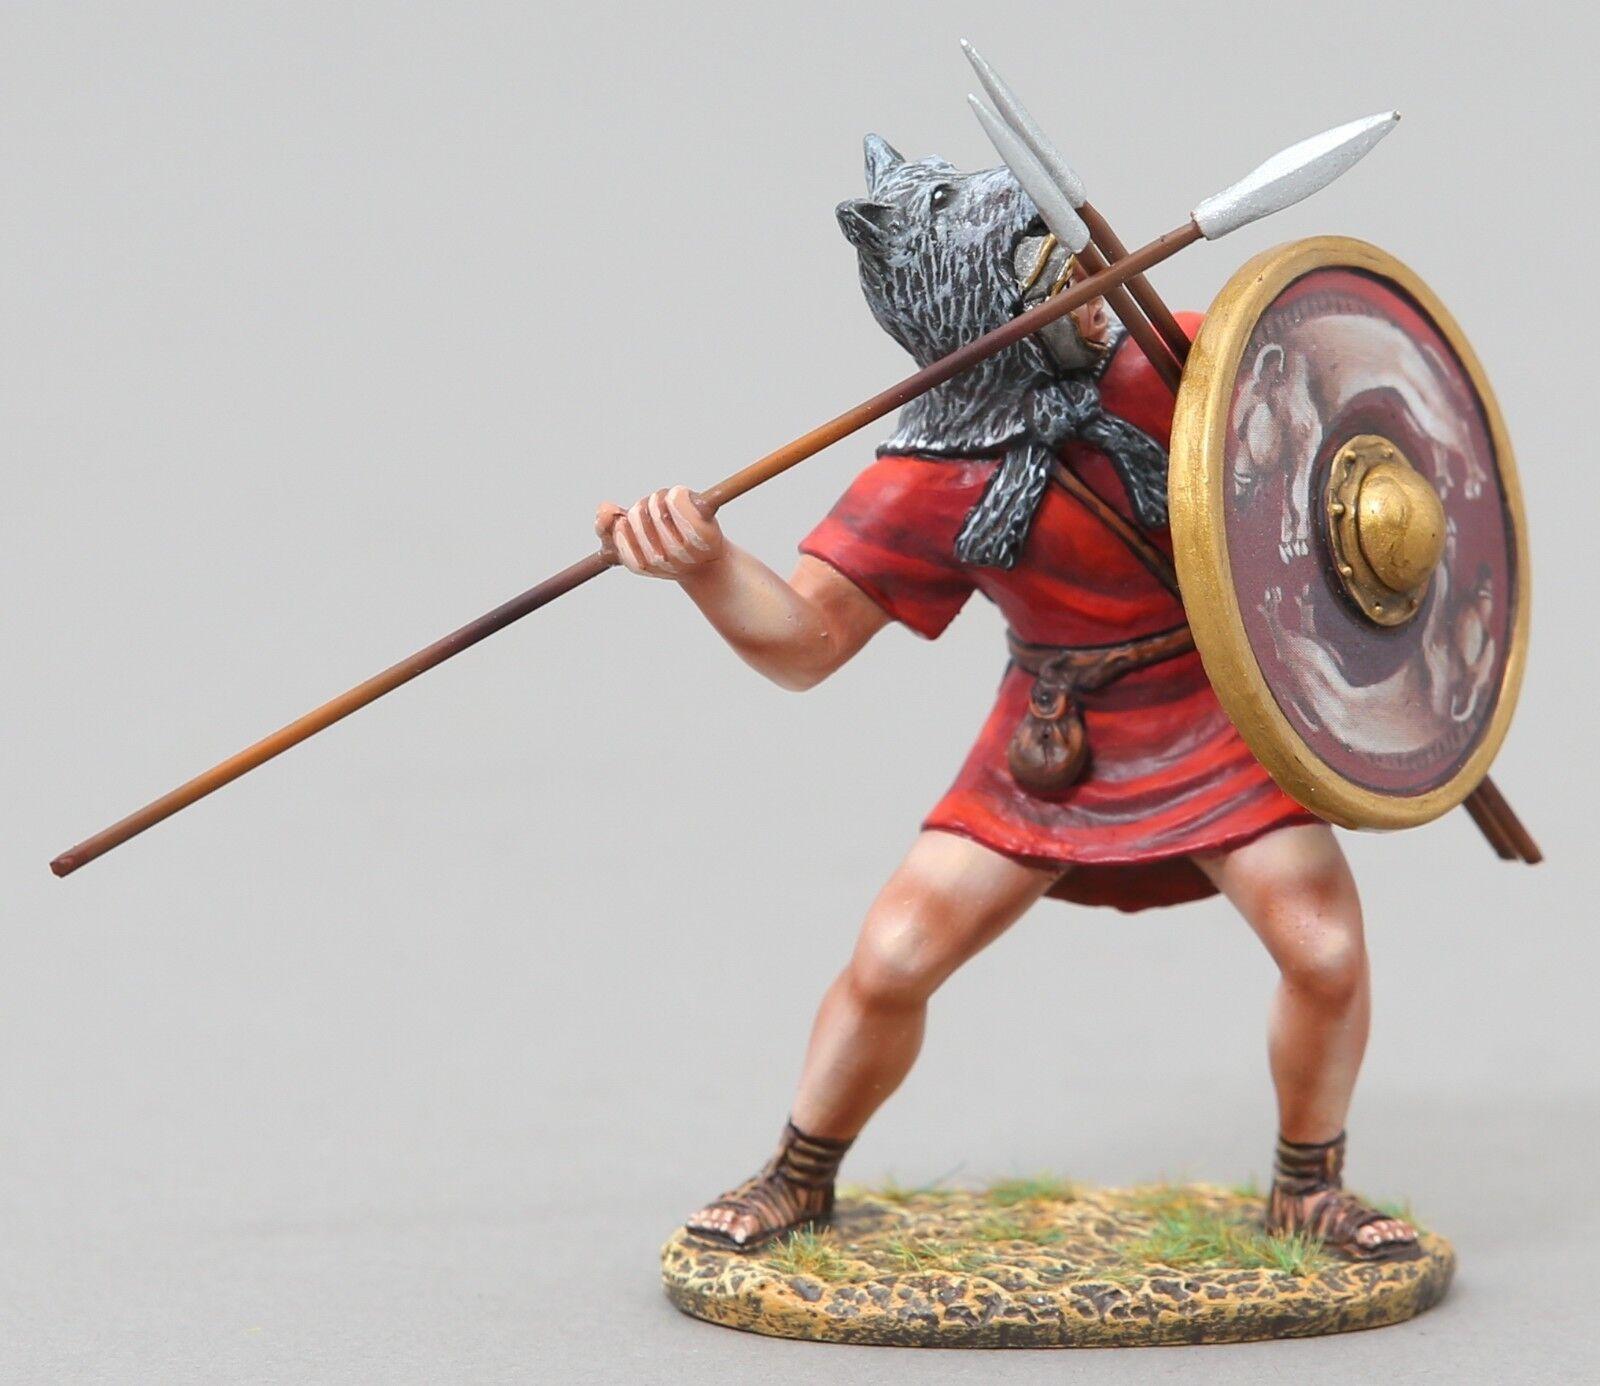 Thomas Gunn Roman Empire ROMREP002 Roman Velite Wurf Speer MIB